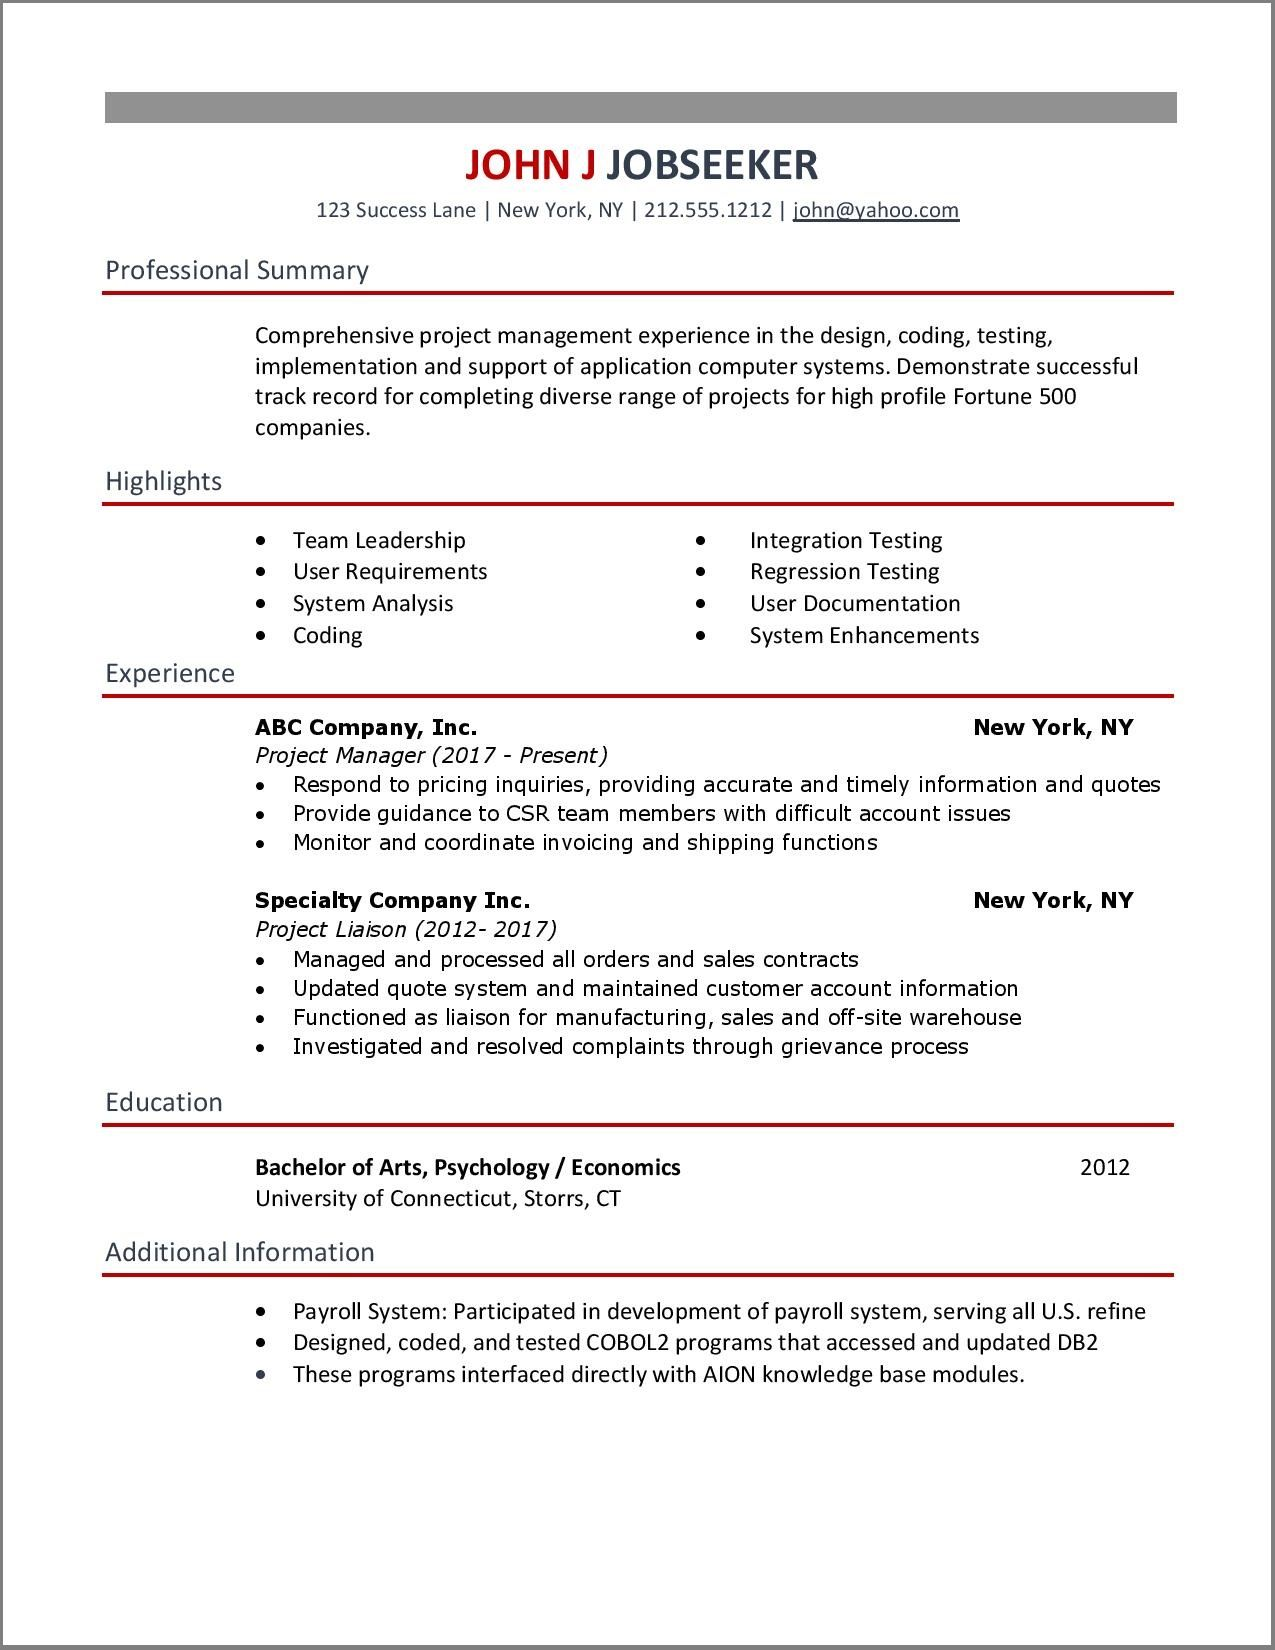 Harmony resume looking for the best pharmacist resume